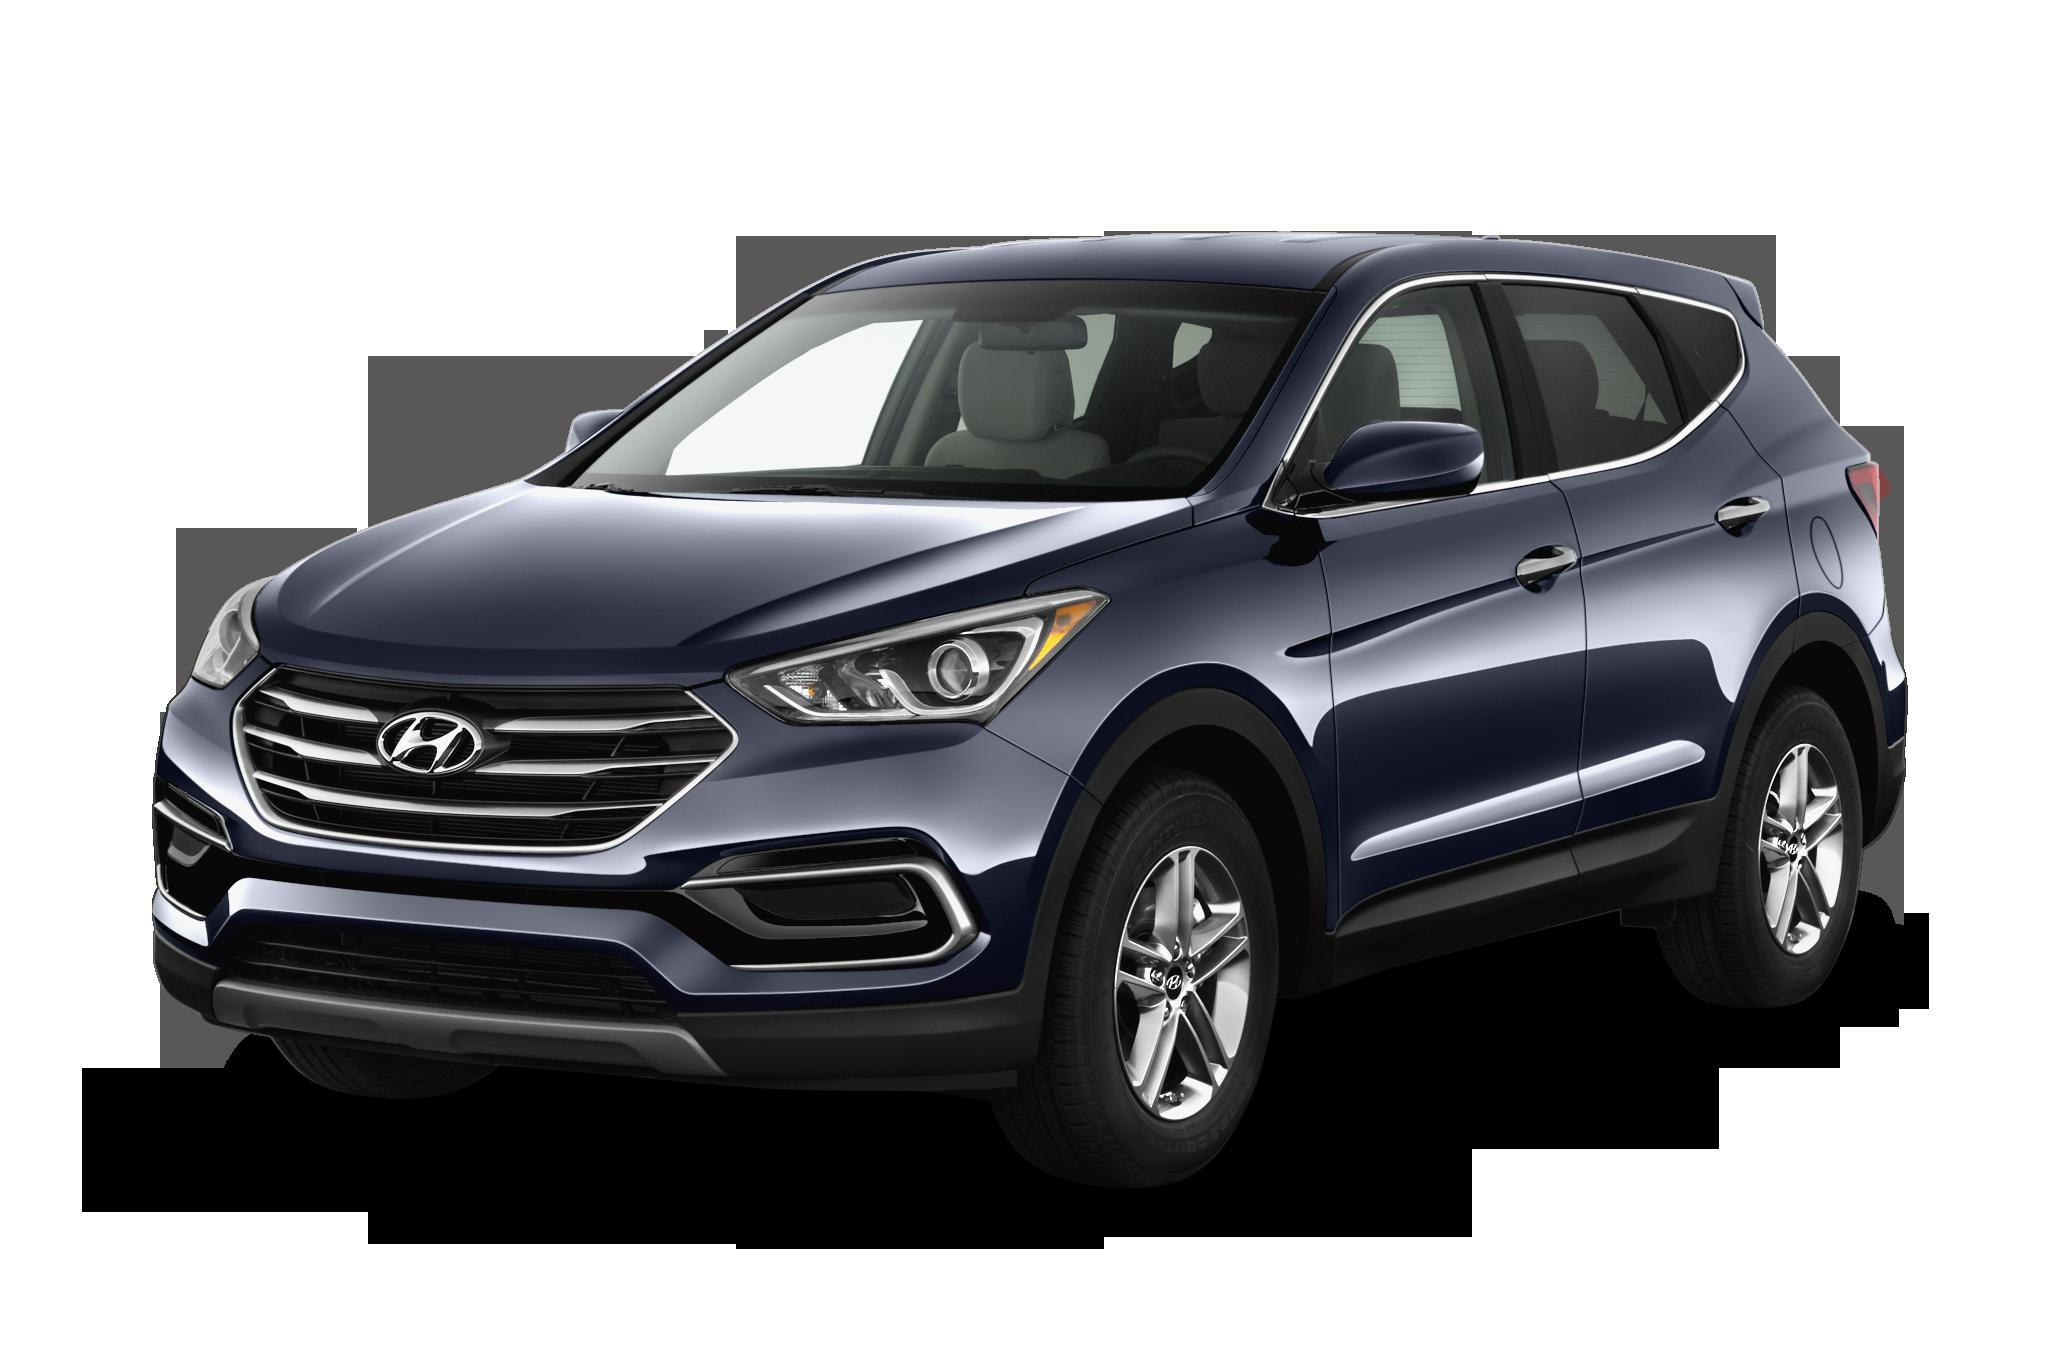 Hyundai PNG Image Background.